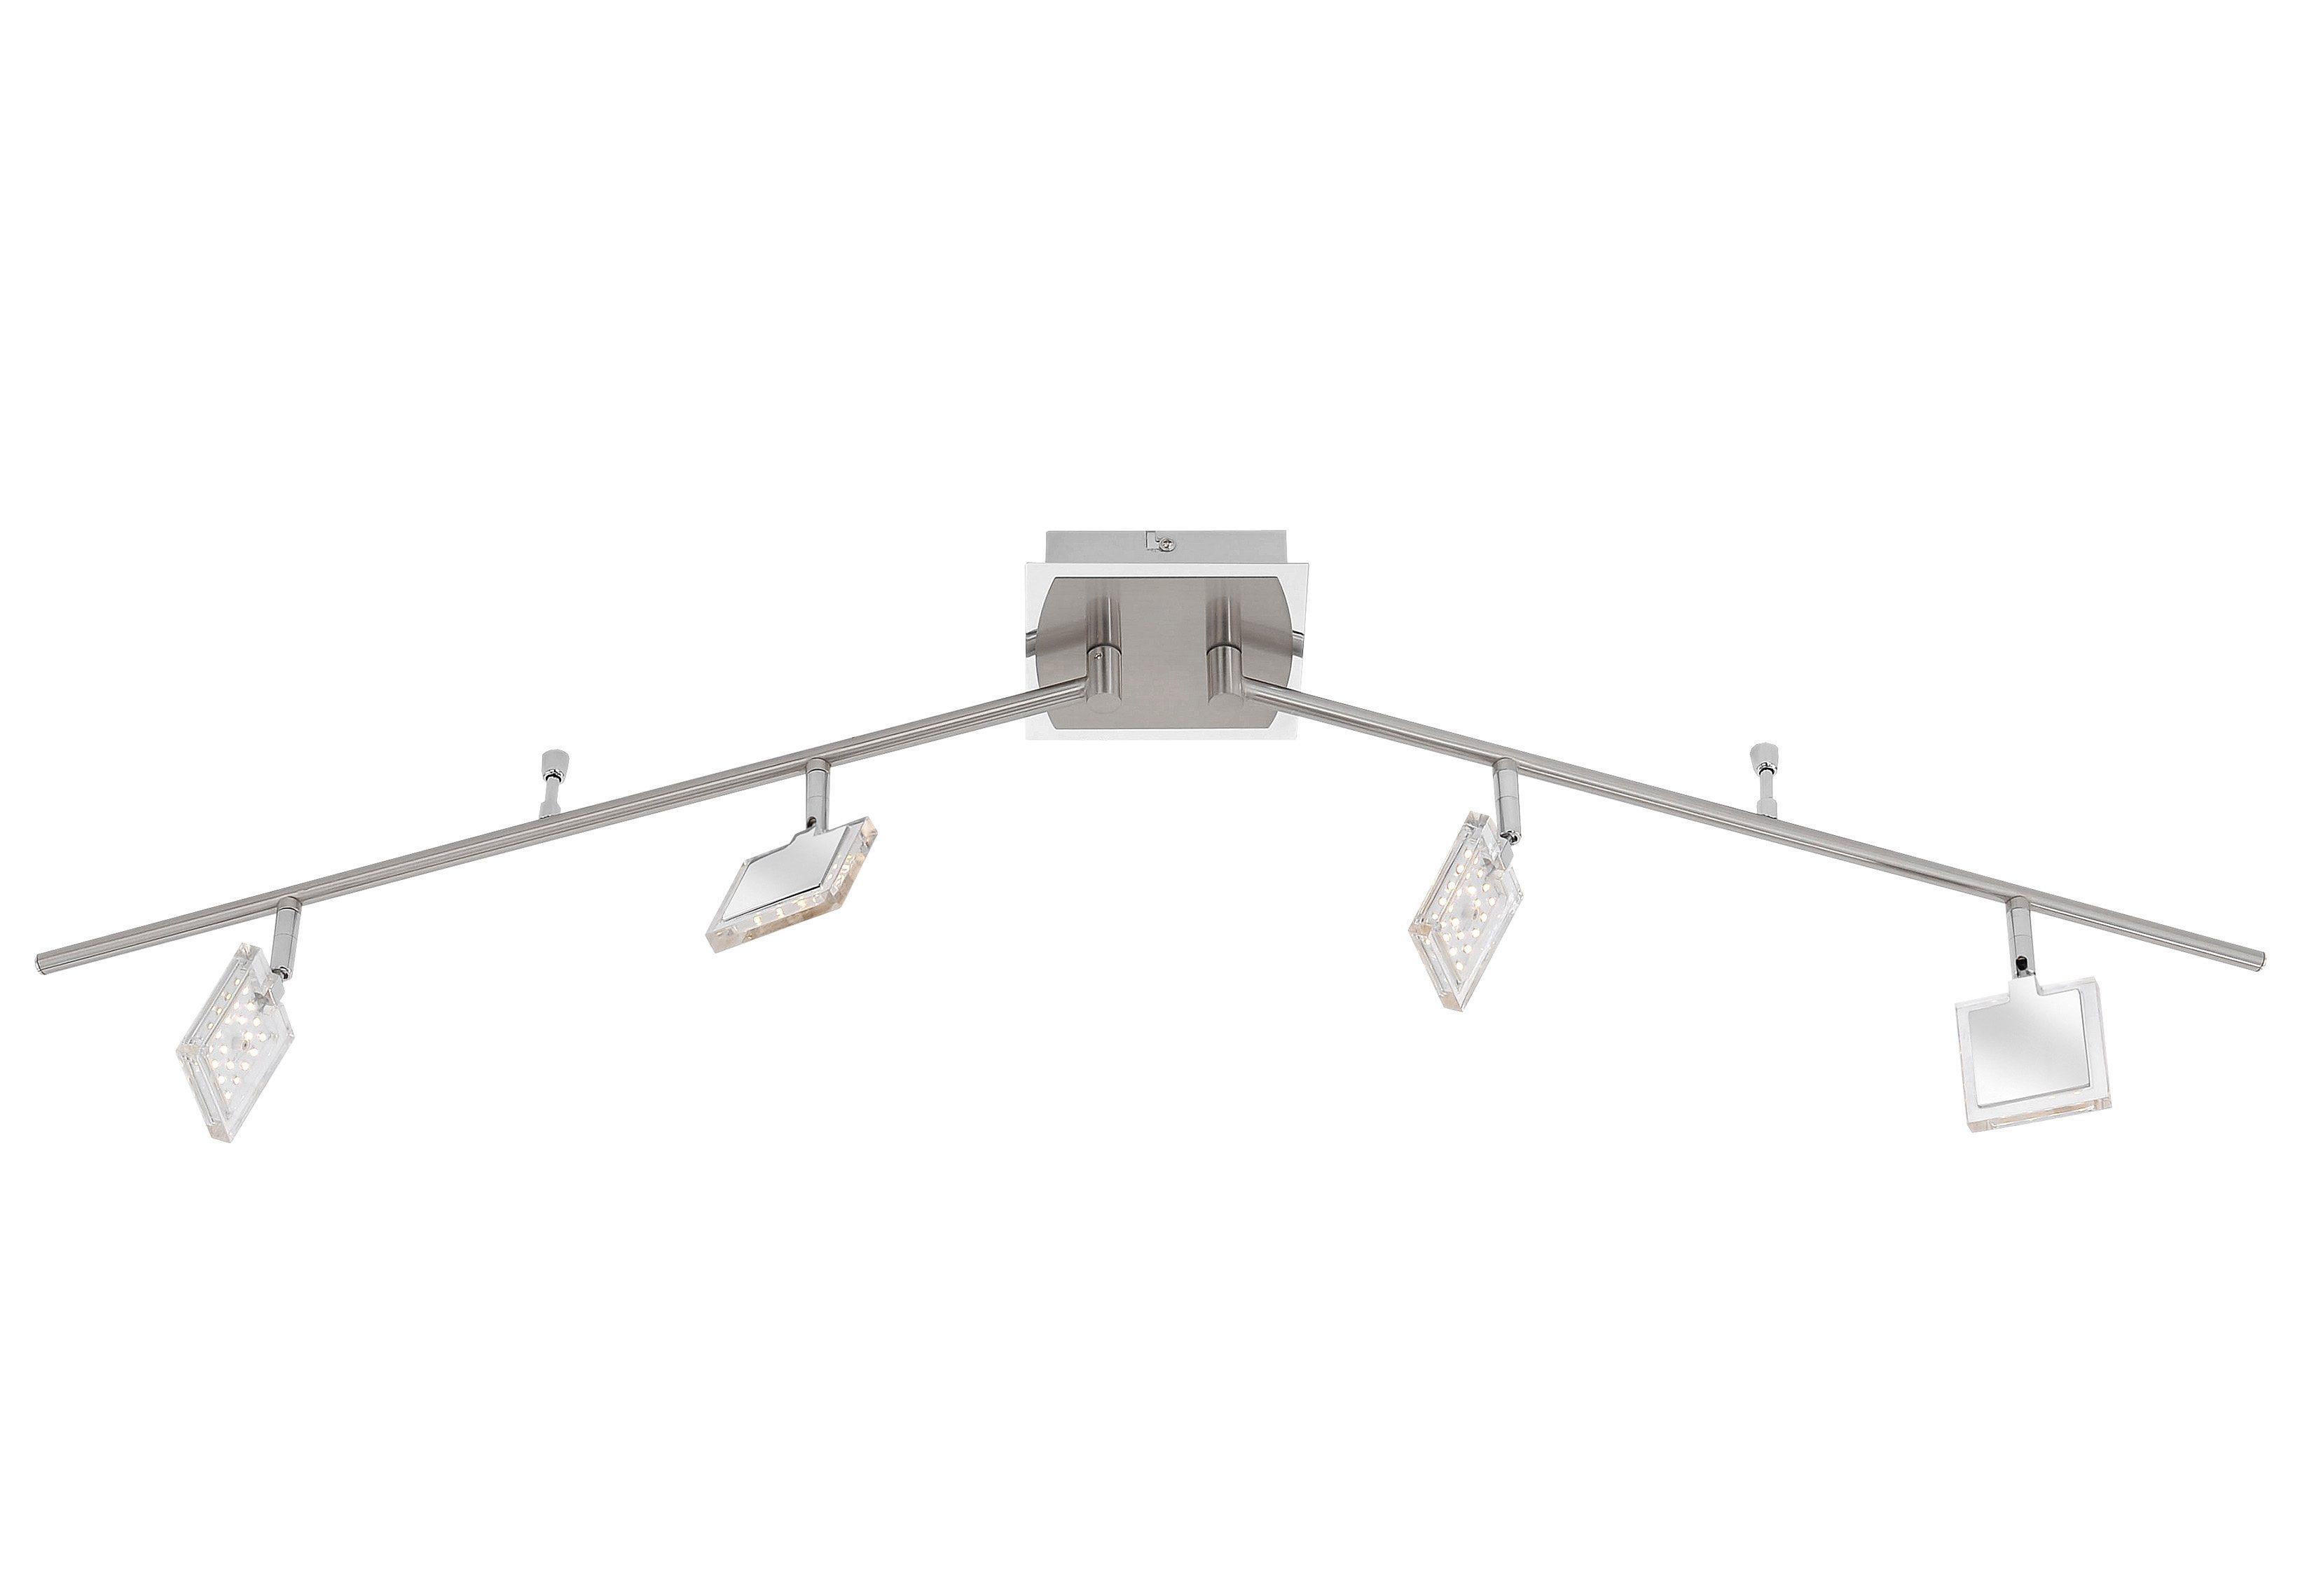 Paul Neuhaus LED-Deckenleuchte, 4flg., »DAAN«